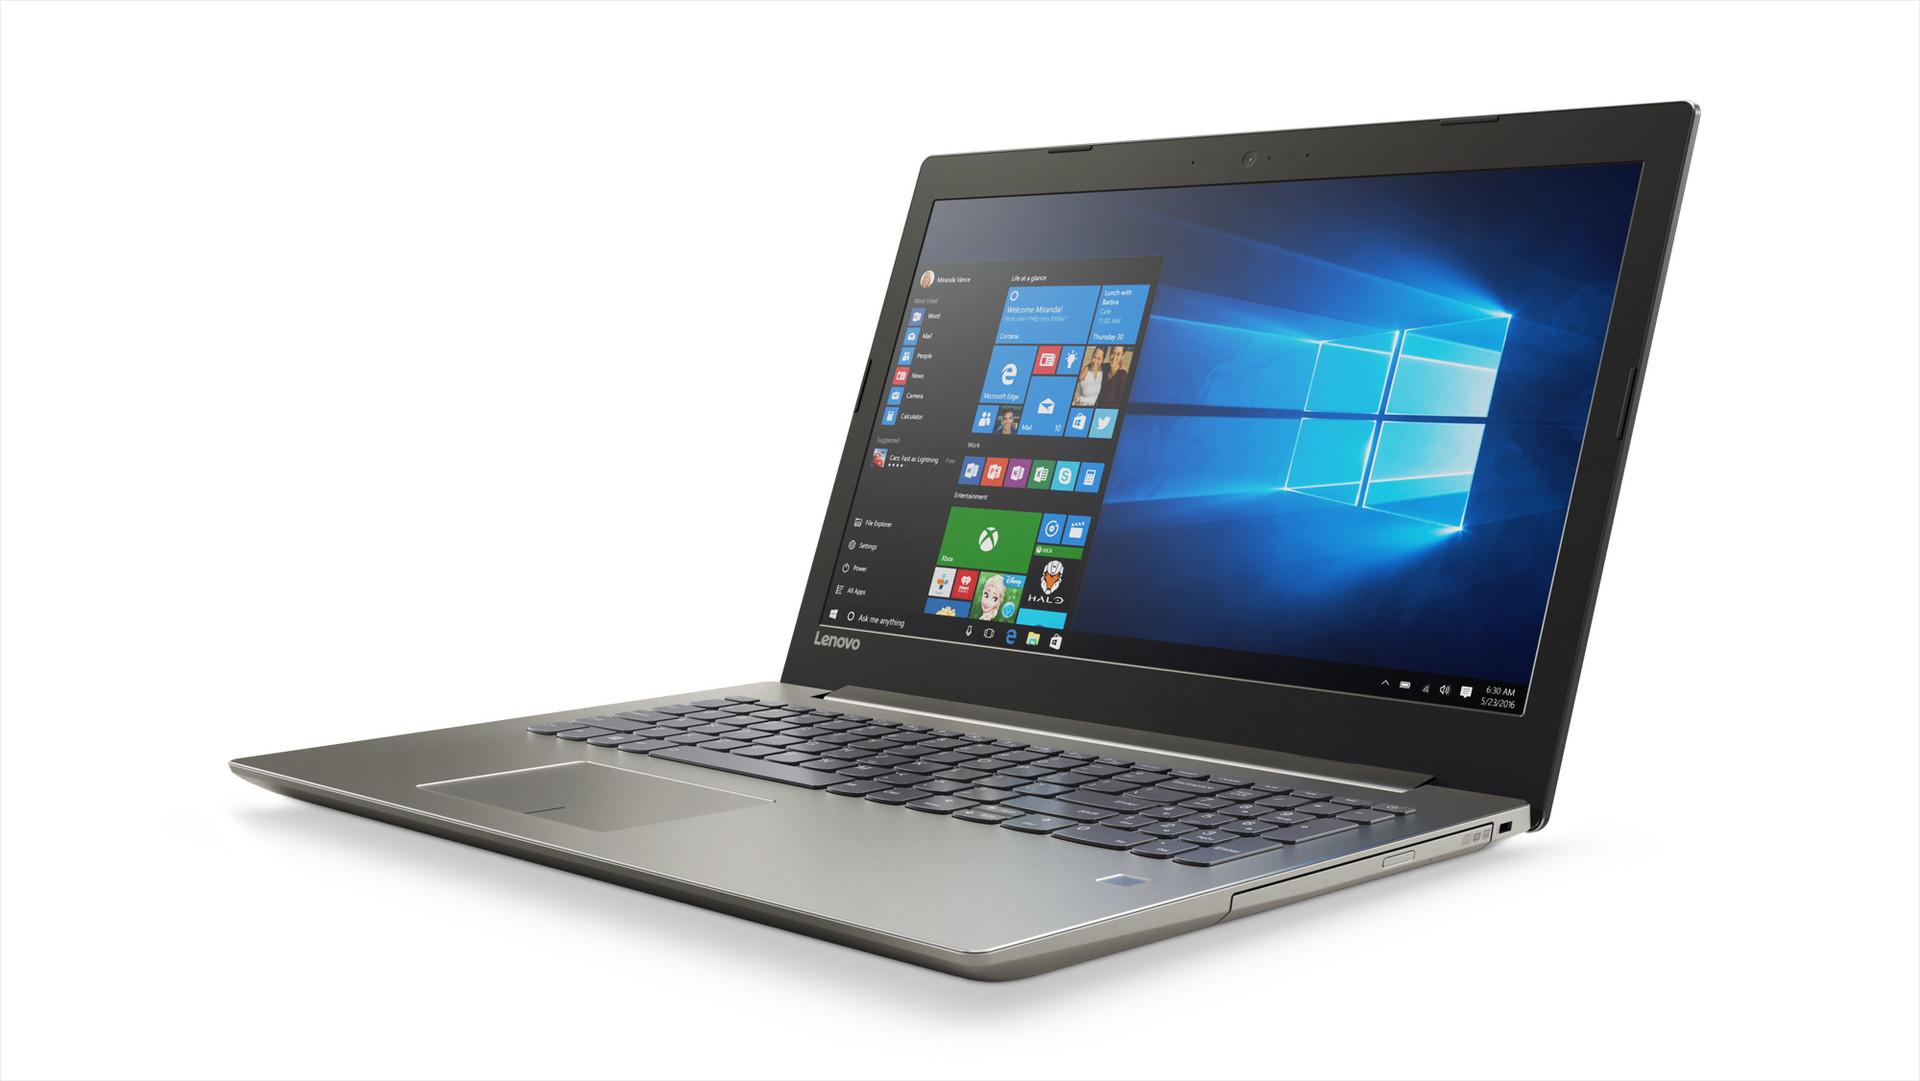 Lenovo Ideapad 520 15ikb 80yl005bmh Notebookcheck Net